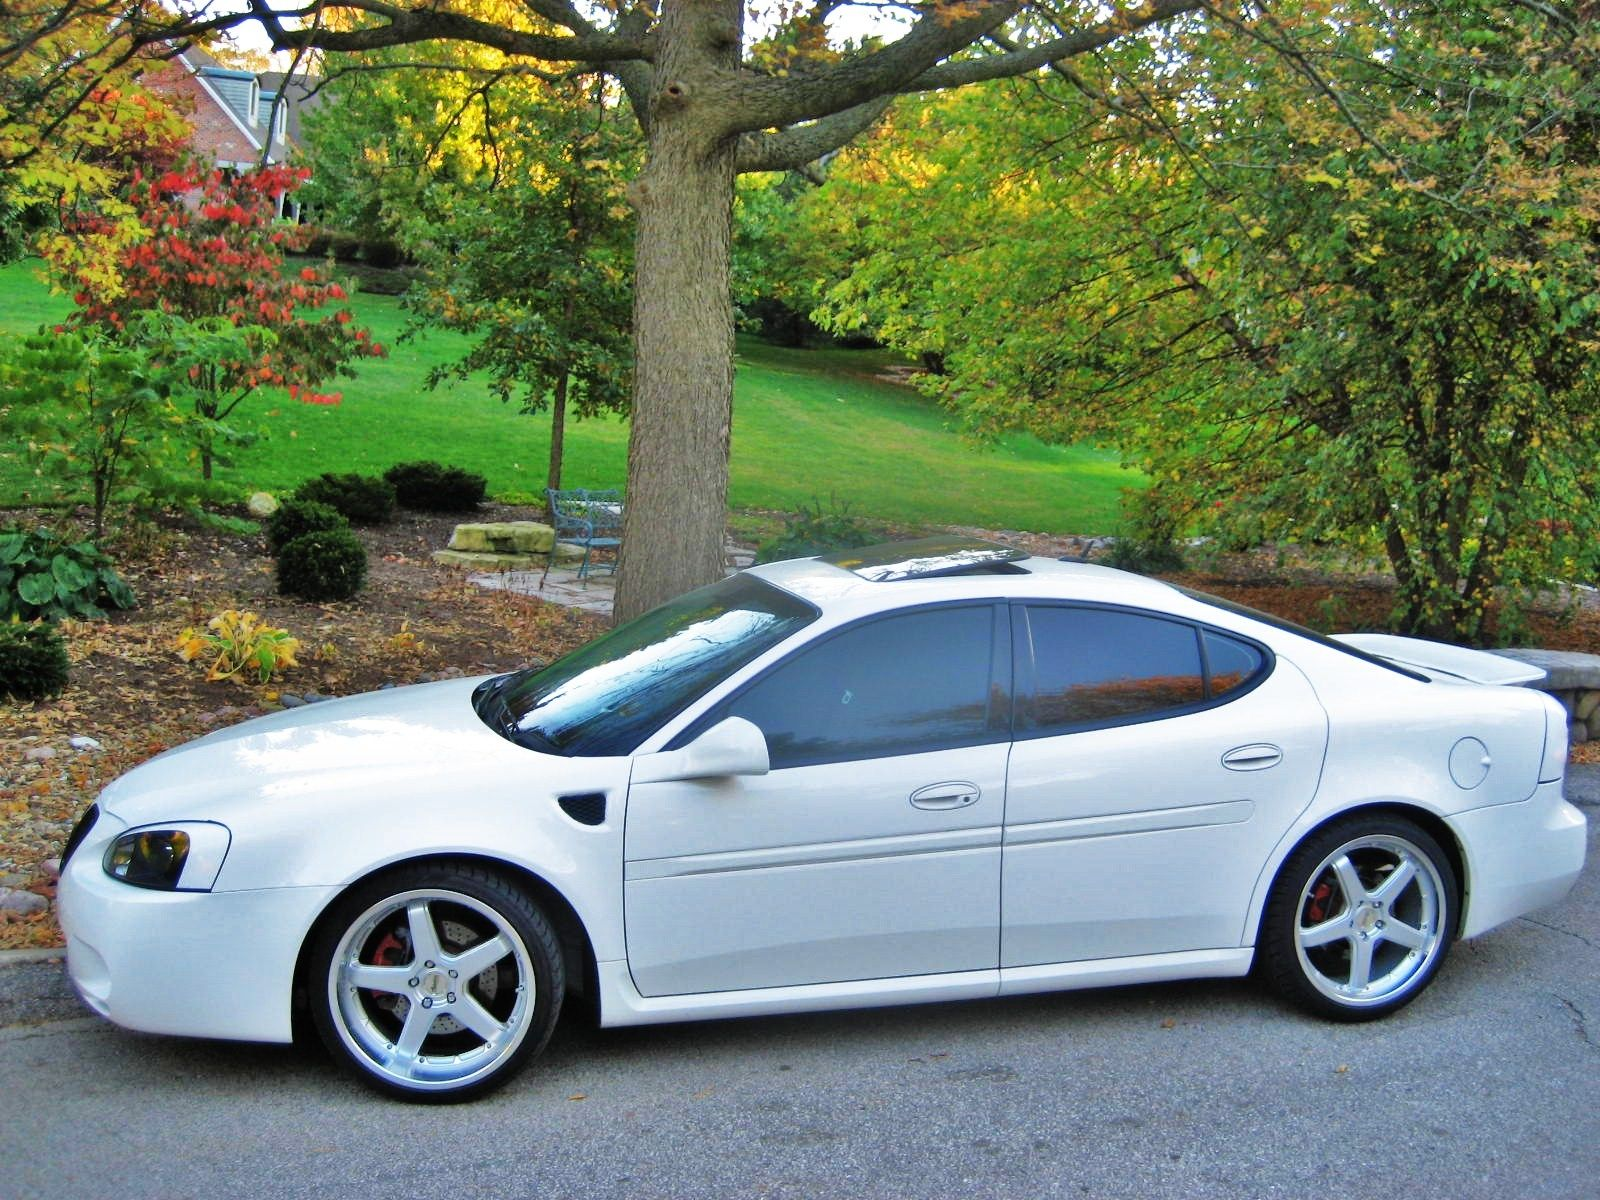 Pontiac grand prix gxp google search pontiac pinterest pontiac grand prix gxp google search publicscrutiny Images